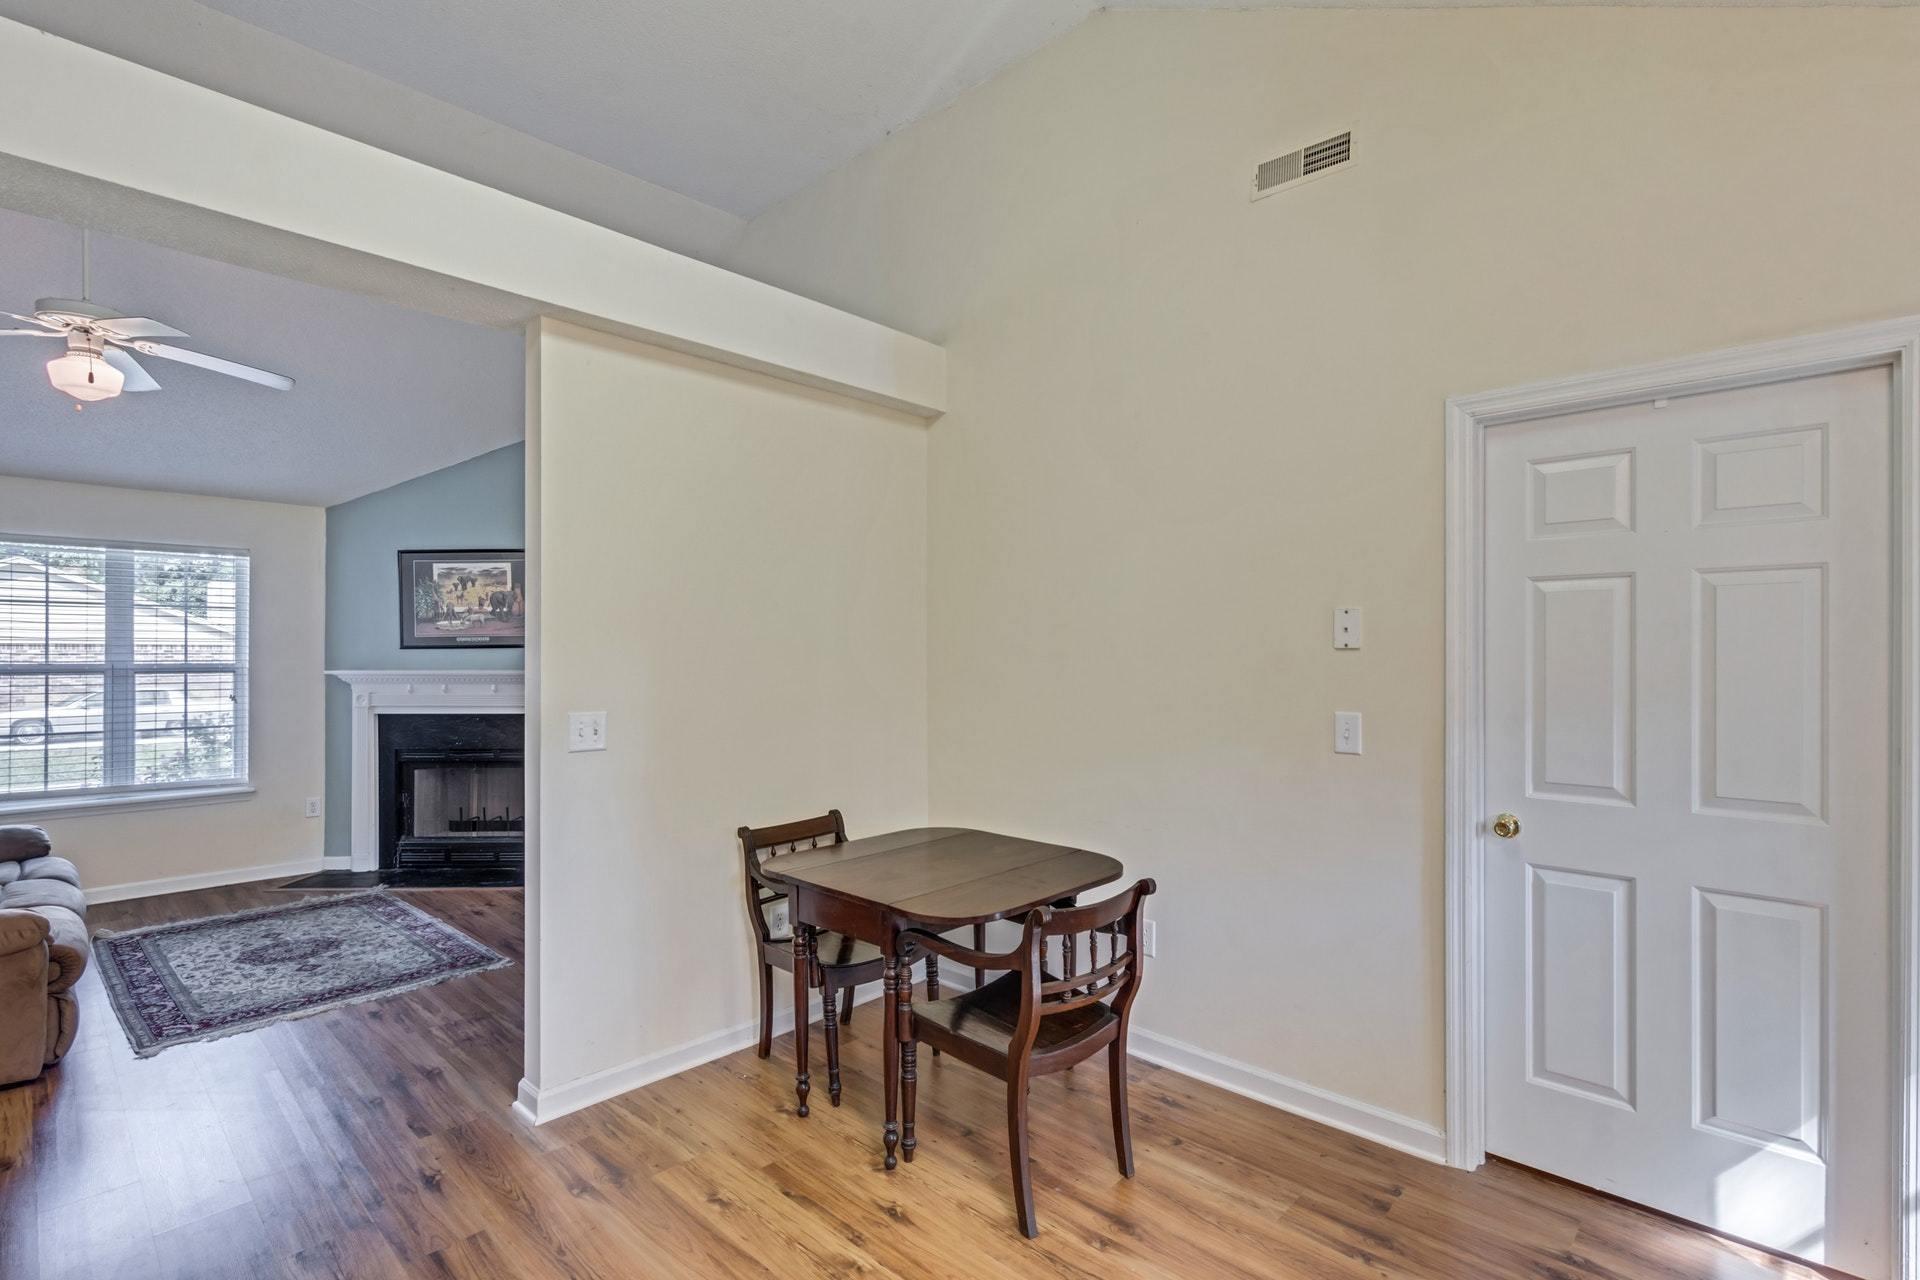 Double Oaks Homes For Sale - 2402 Double Oak, Charleston, SC - 9